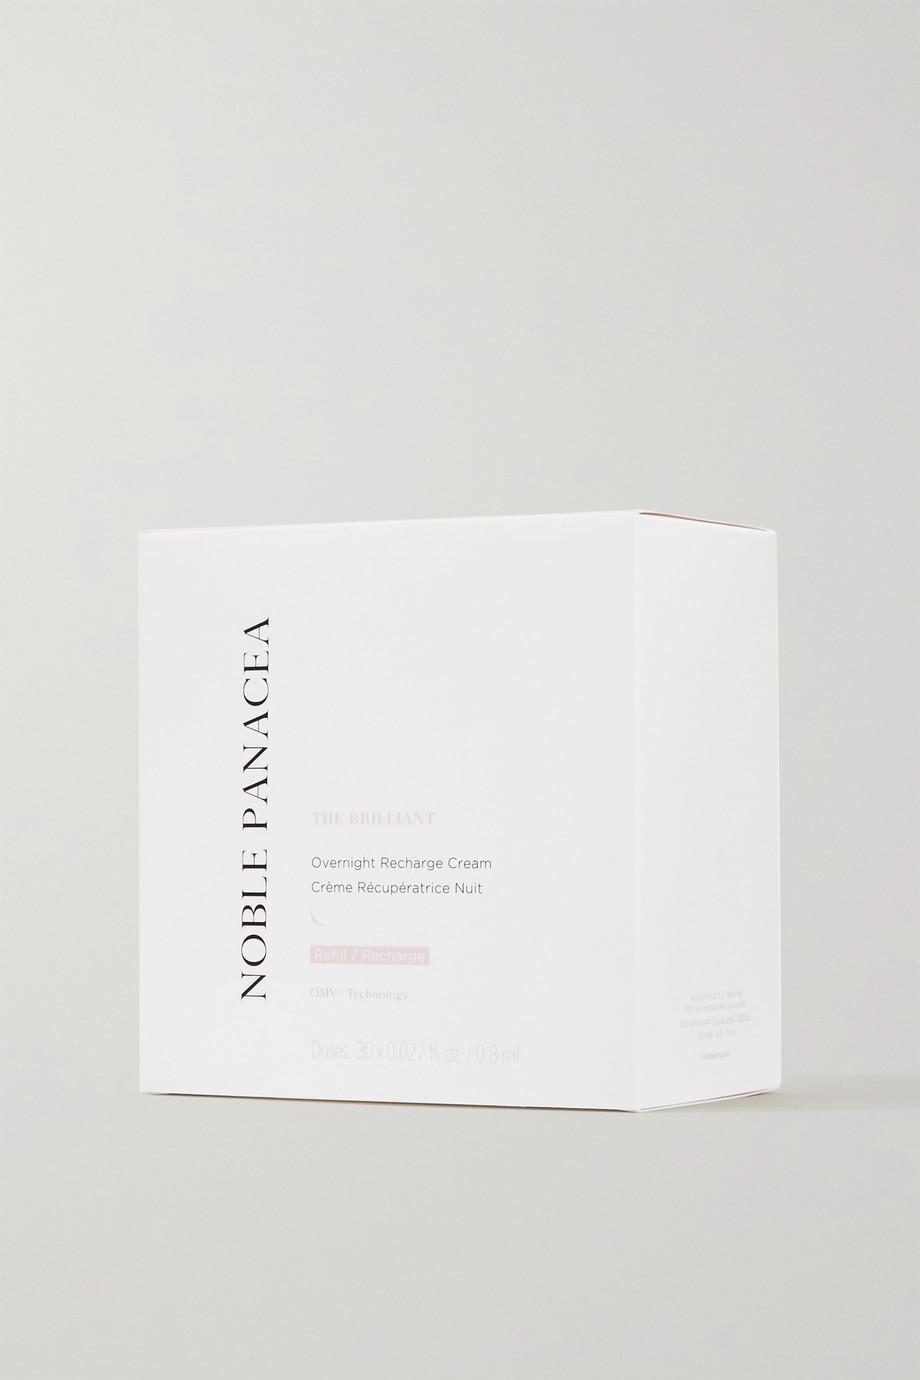 Noble Panacea The Brilliant Overnight Recharge Cream Refill, 30 x 0,8 ml – Nachfüll-Nachtcreme